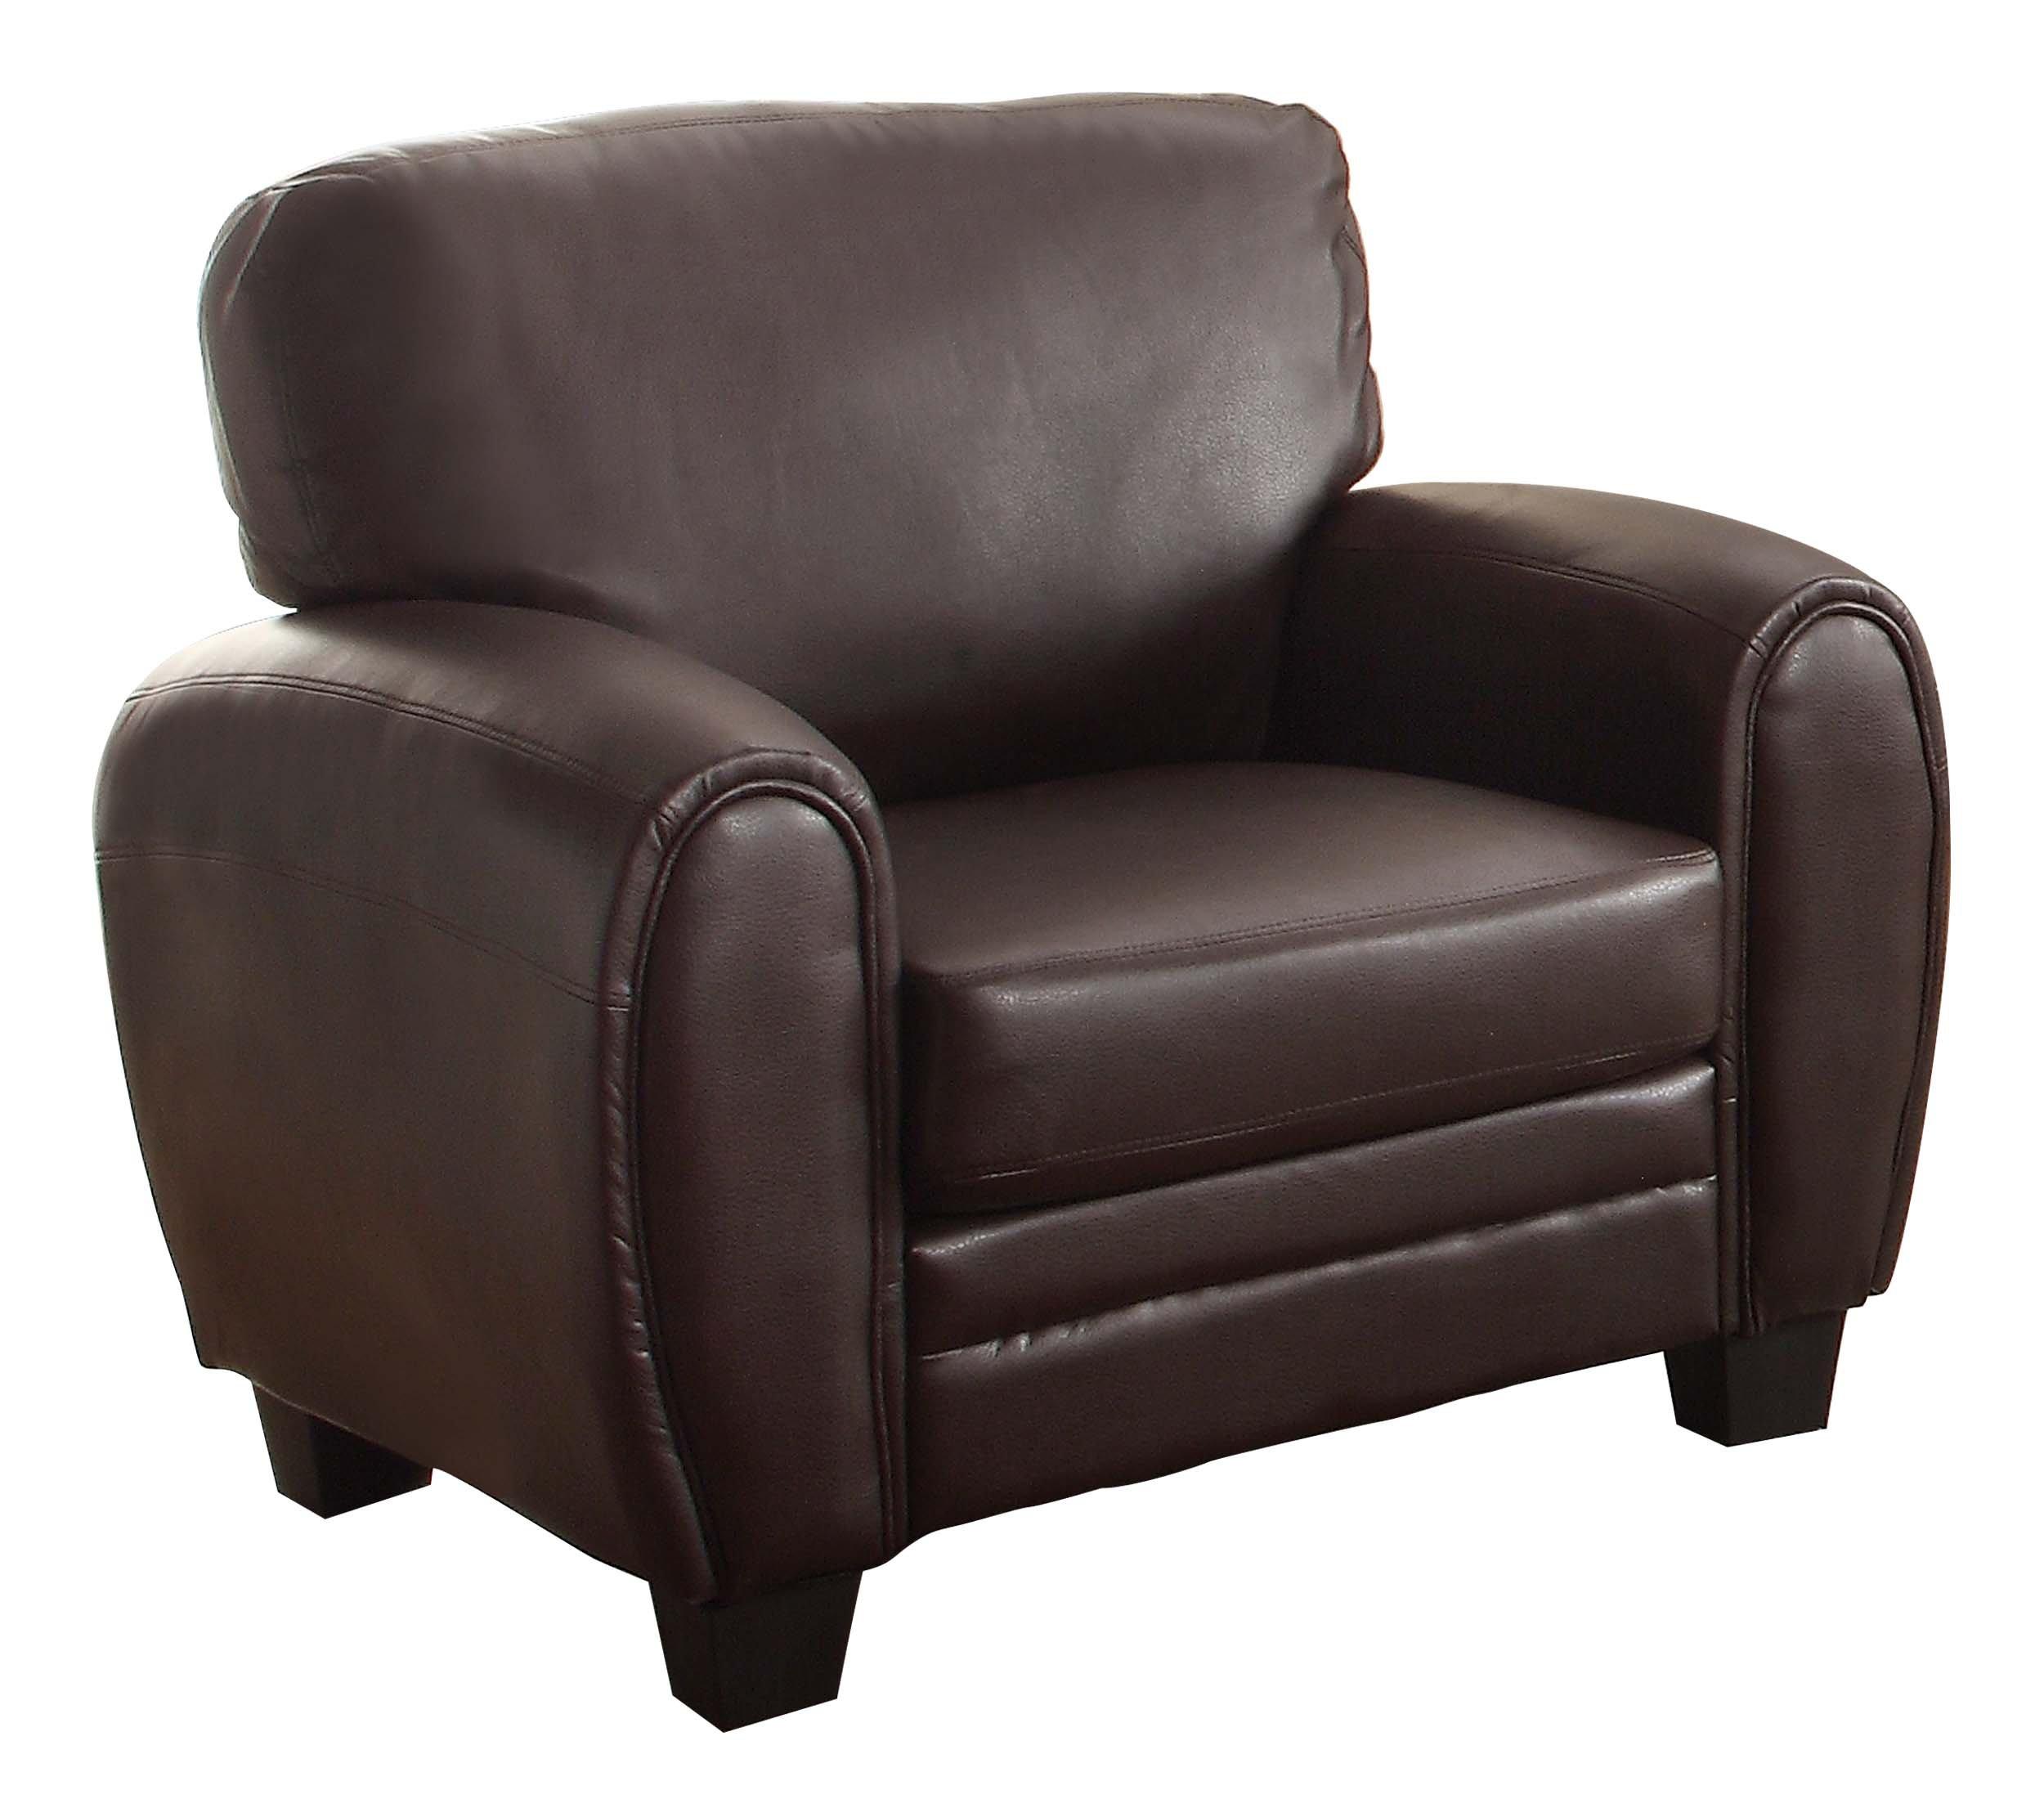 Homelegance 9734DB-1 Upholstered Chair, Dark Brown Bonded Leather Match